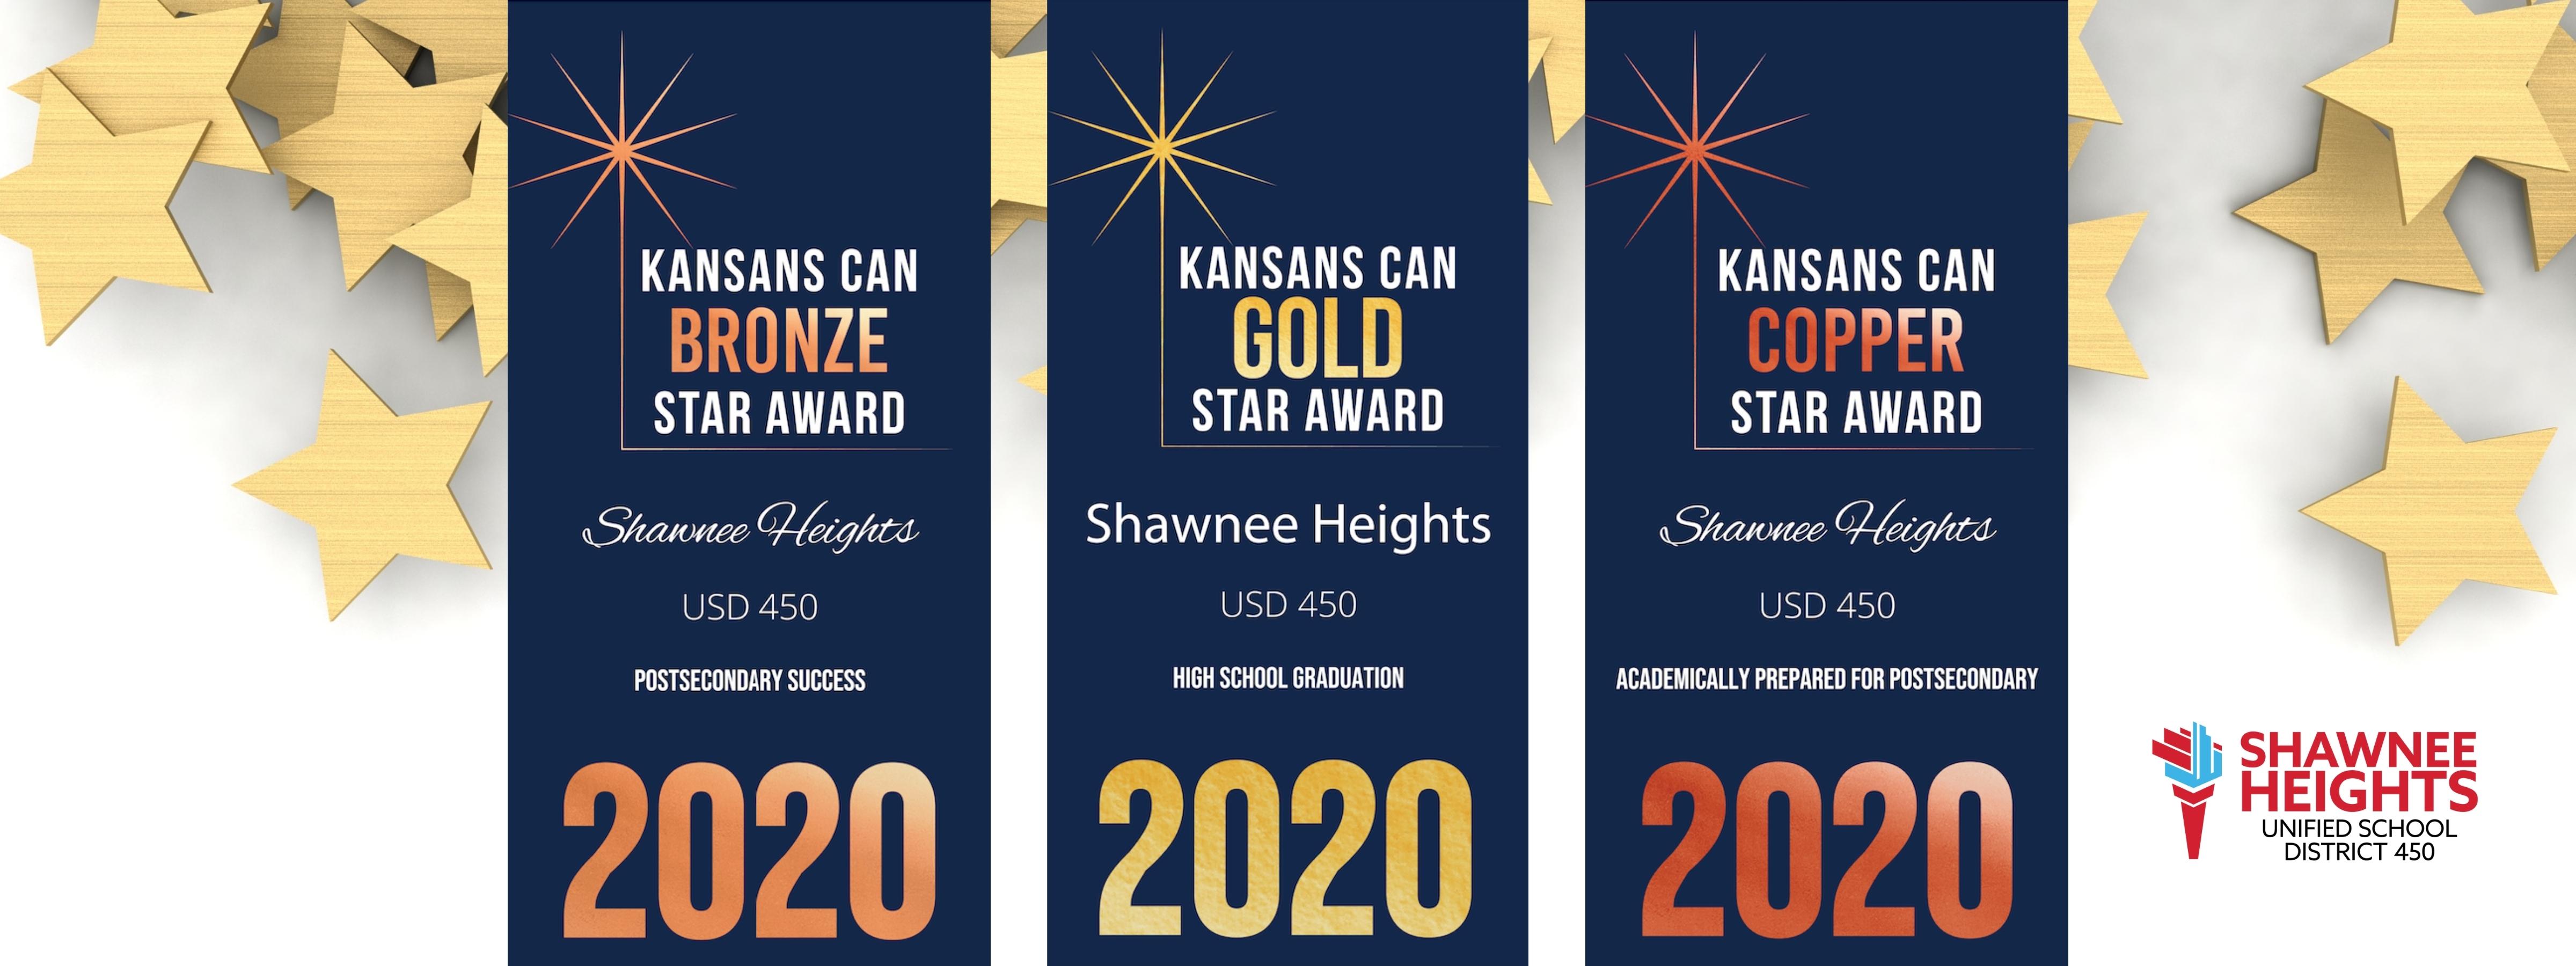 Kansans Can Award Recognitions